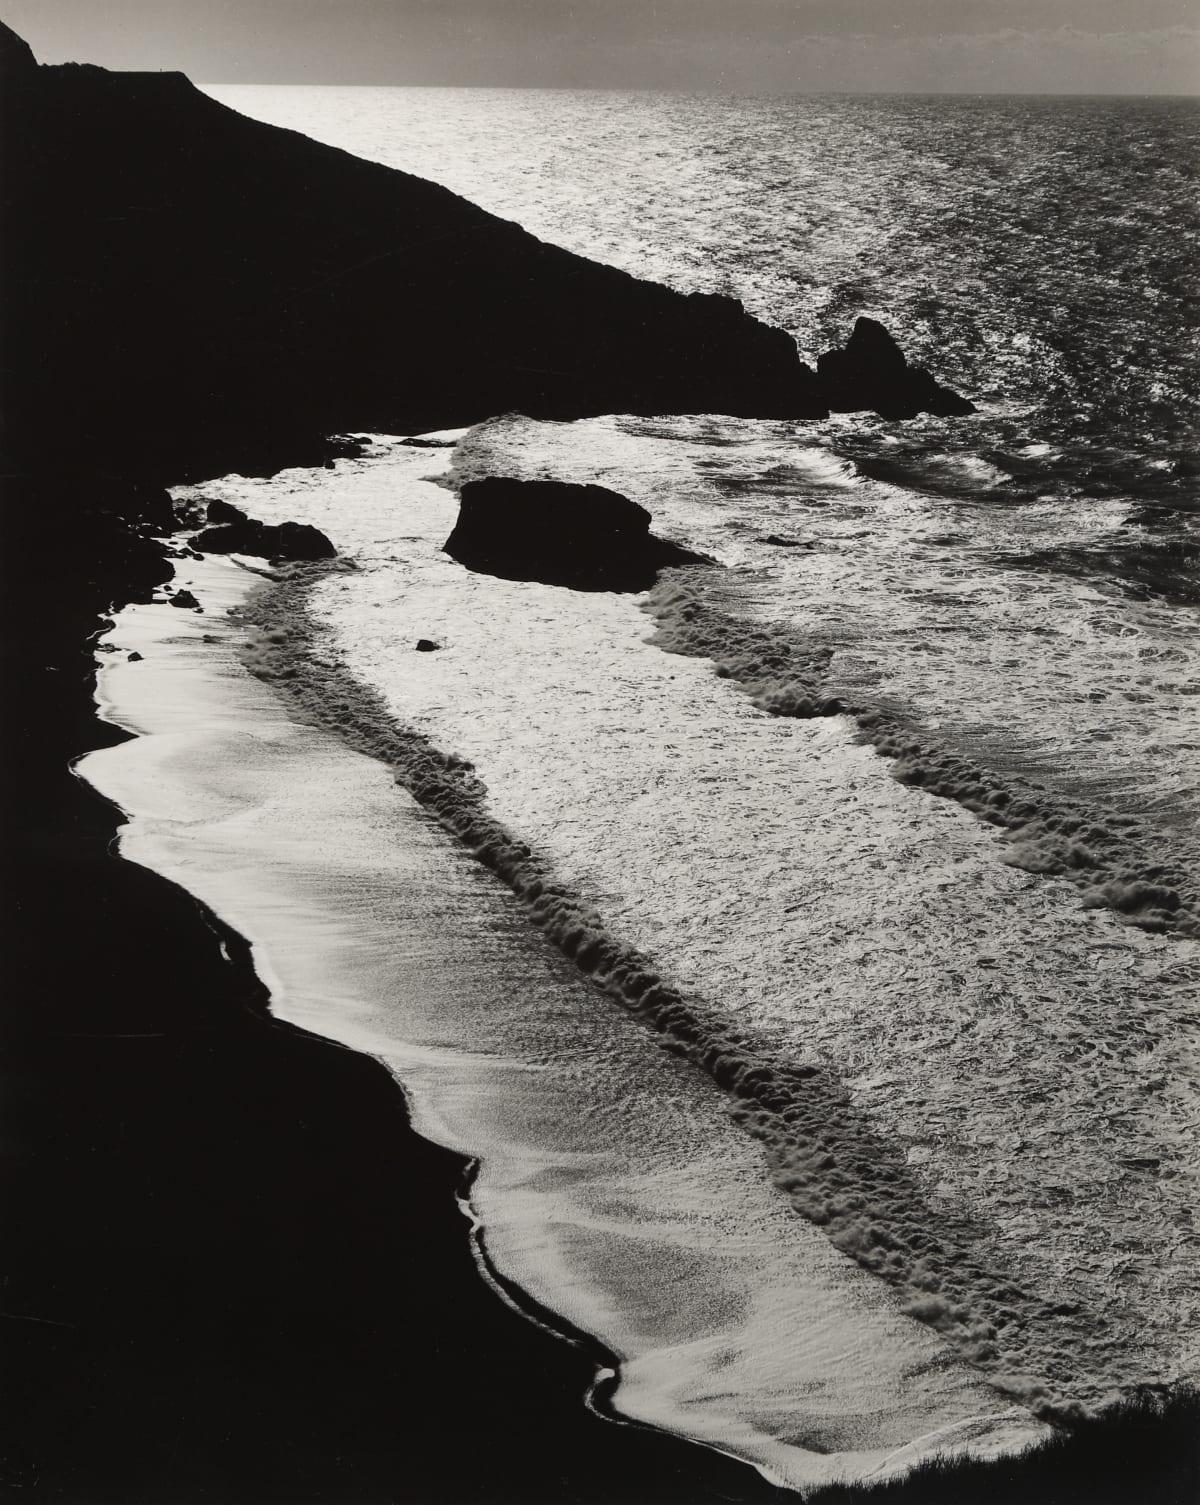 Brett Weston, Big Sur Coast, 1967